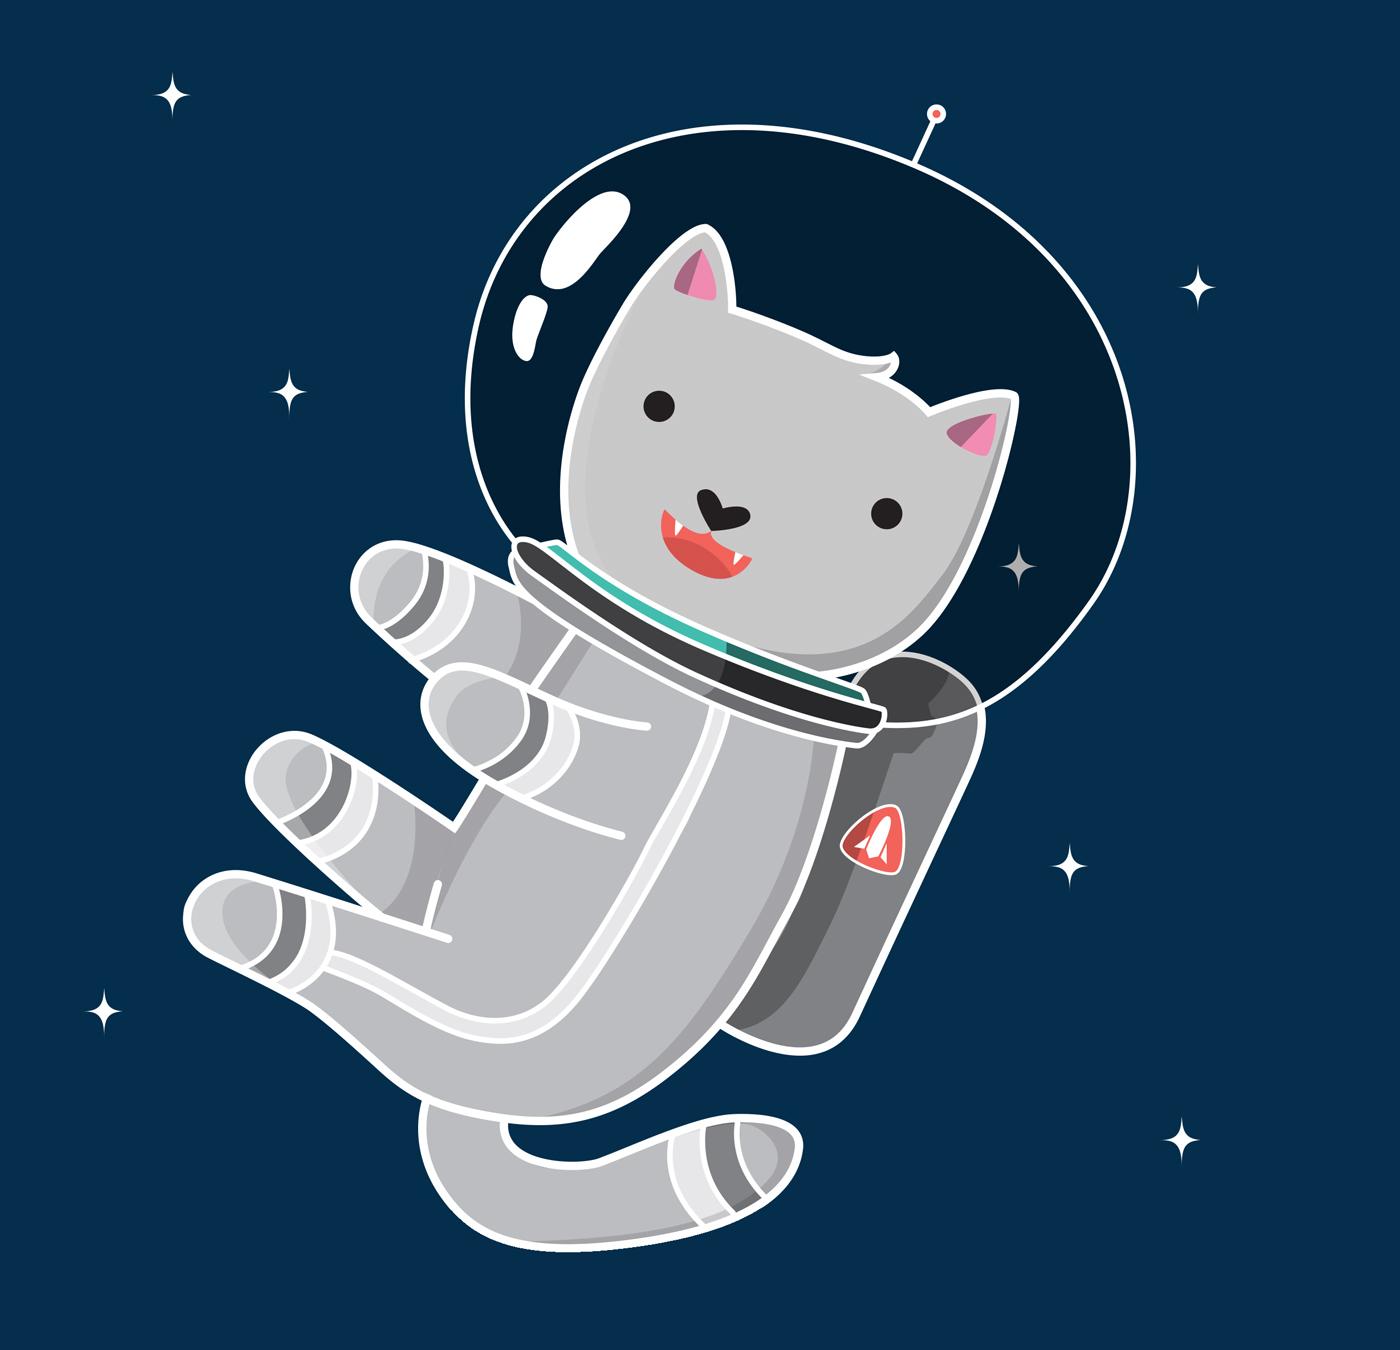 Astronaut clipart cat. Space kitty porsha marais